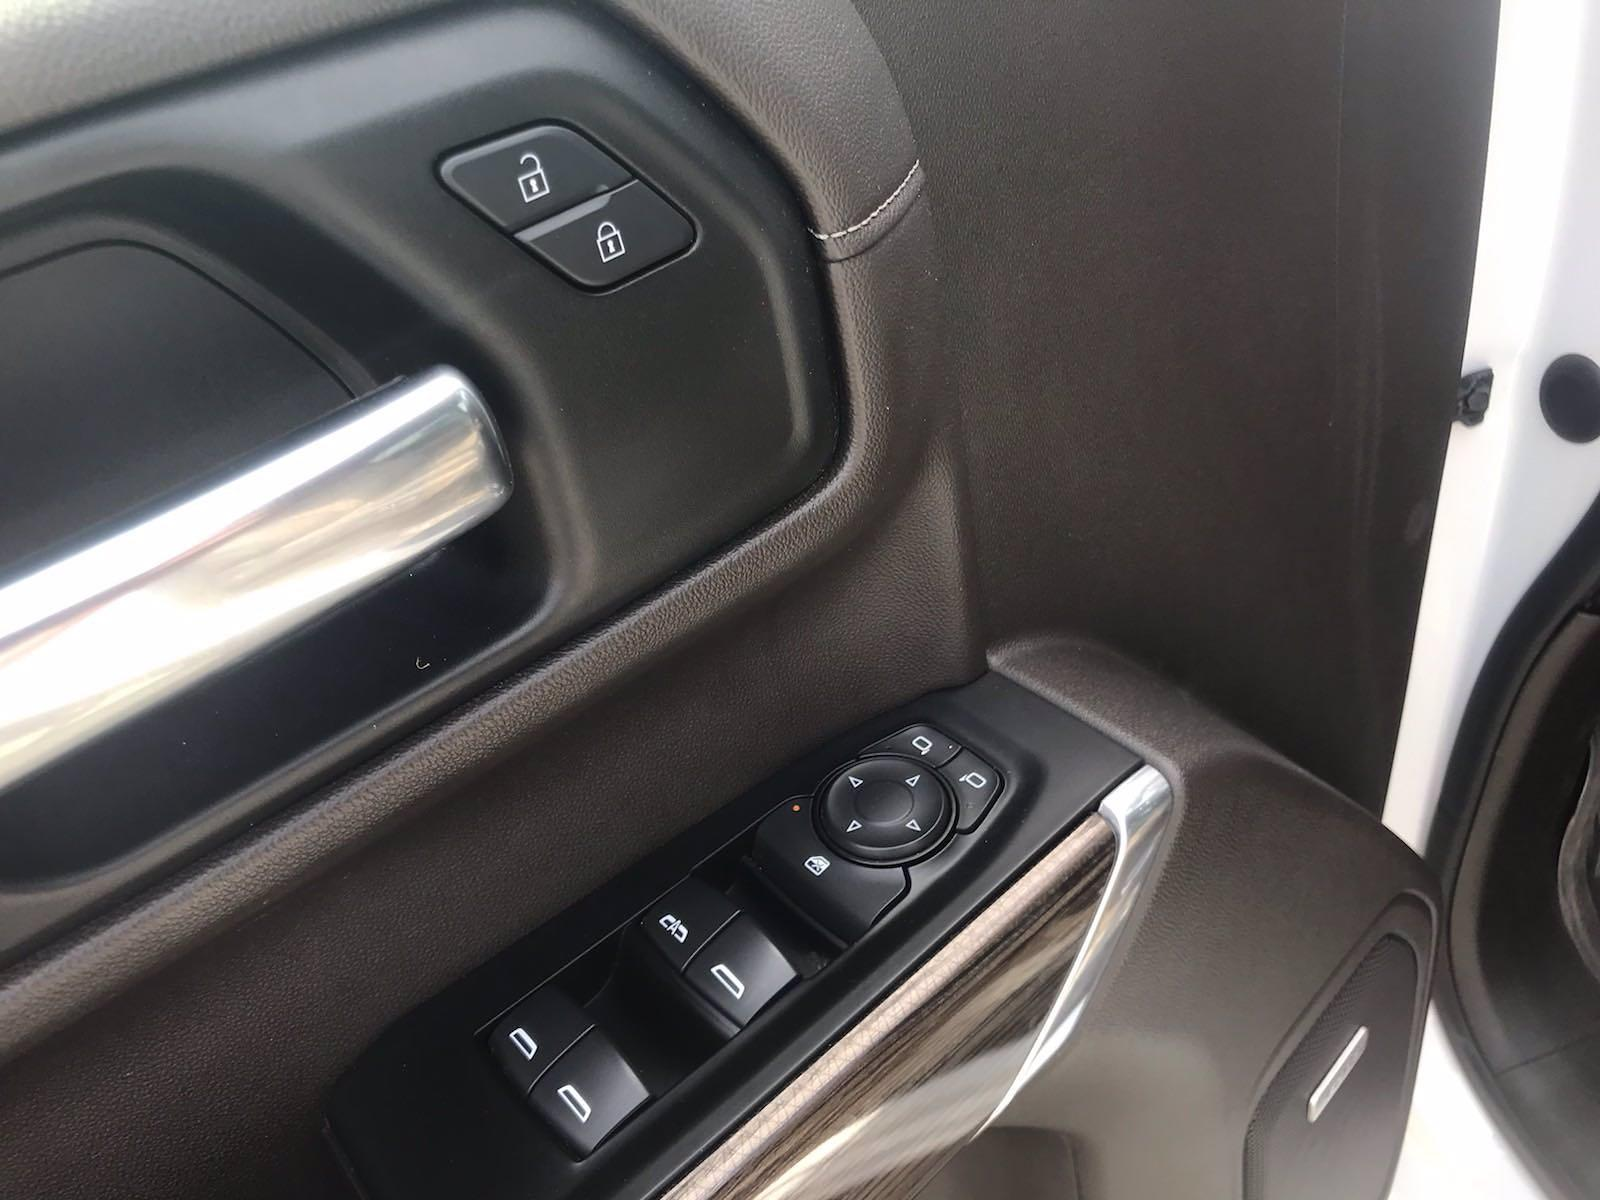 2020 Chevrolet Silverado 1500 Crew Cab 4x4, Pickup #16431PN - photo 21